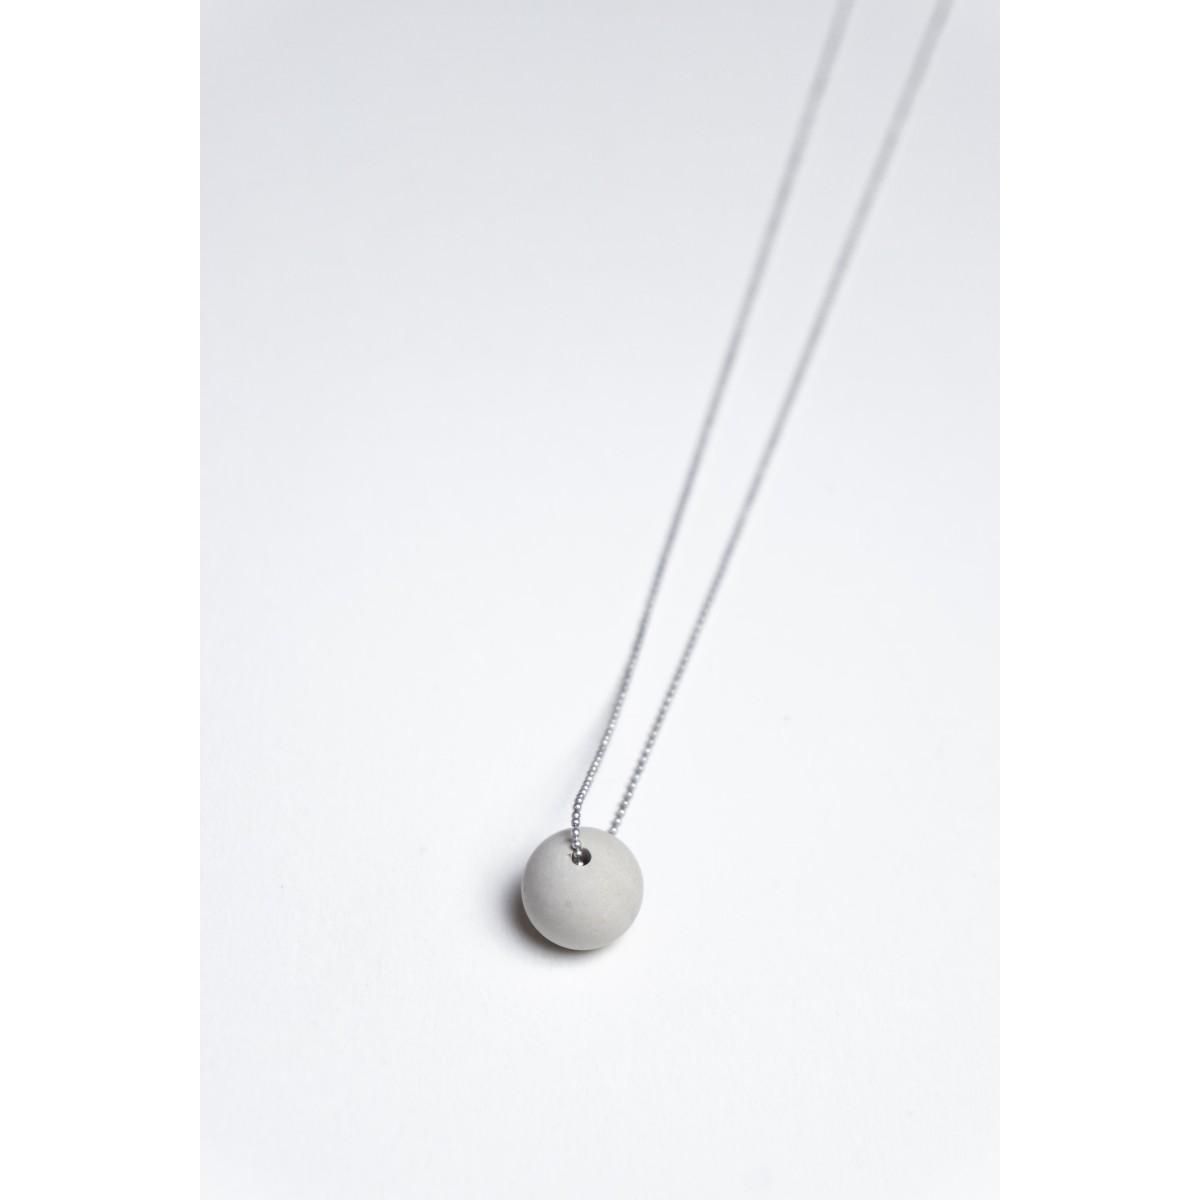 Klunkergrau Betonschmuck | Große Perle aus Beton